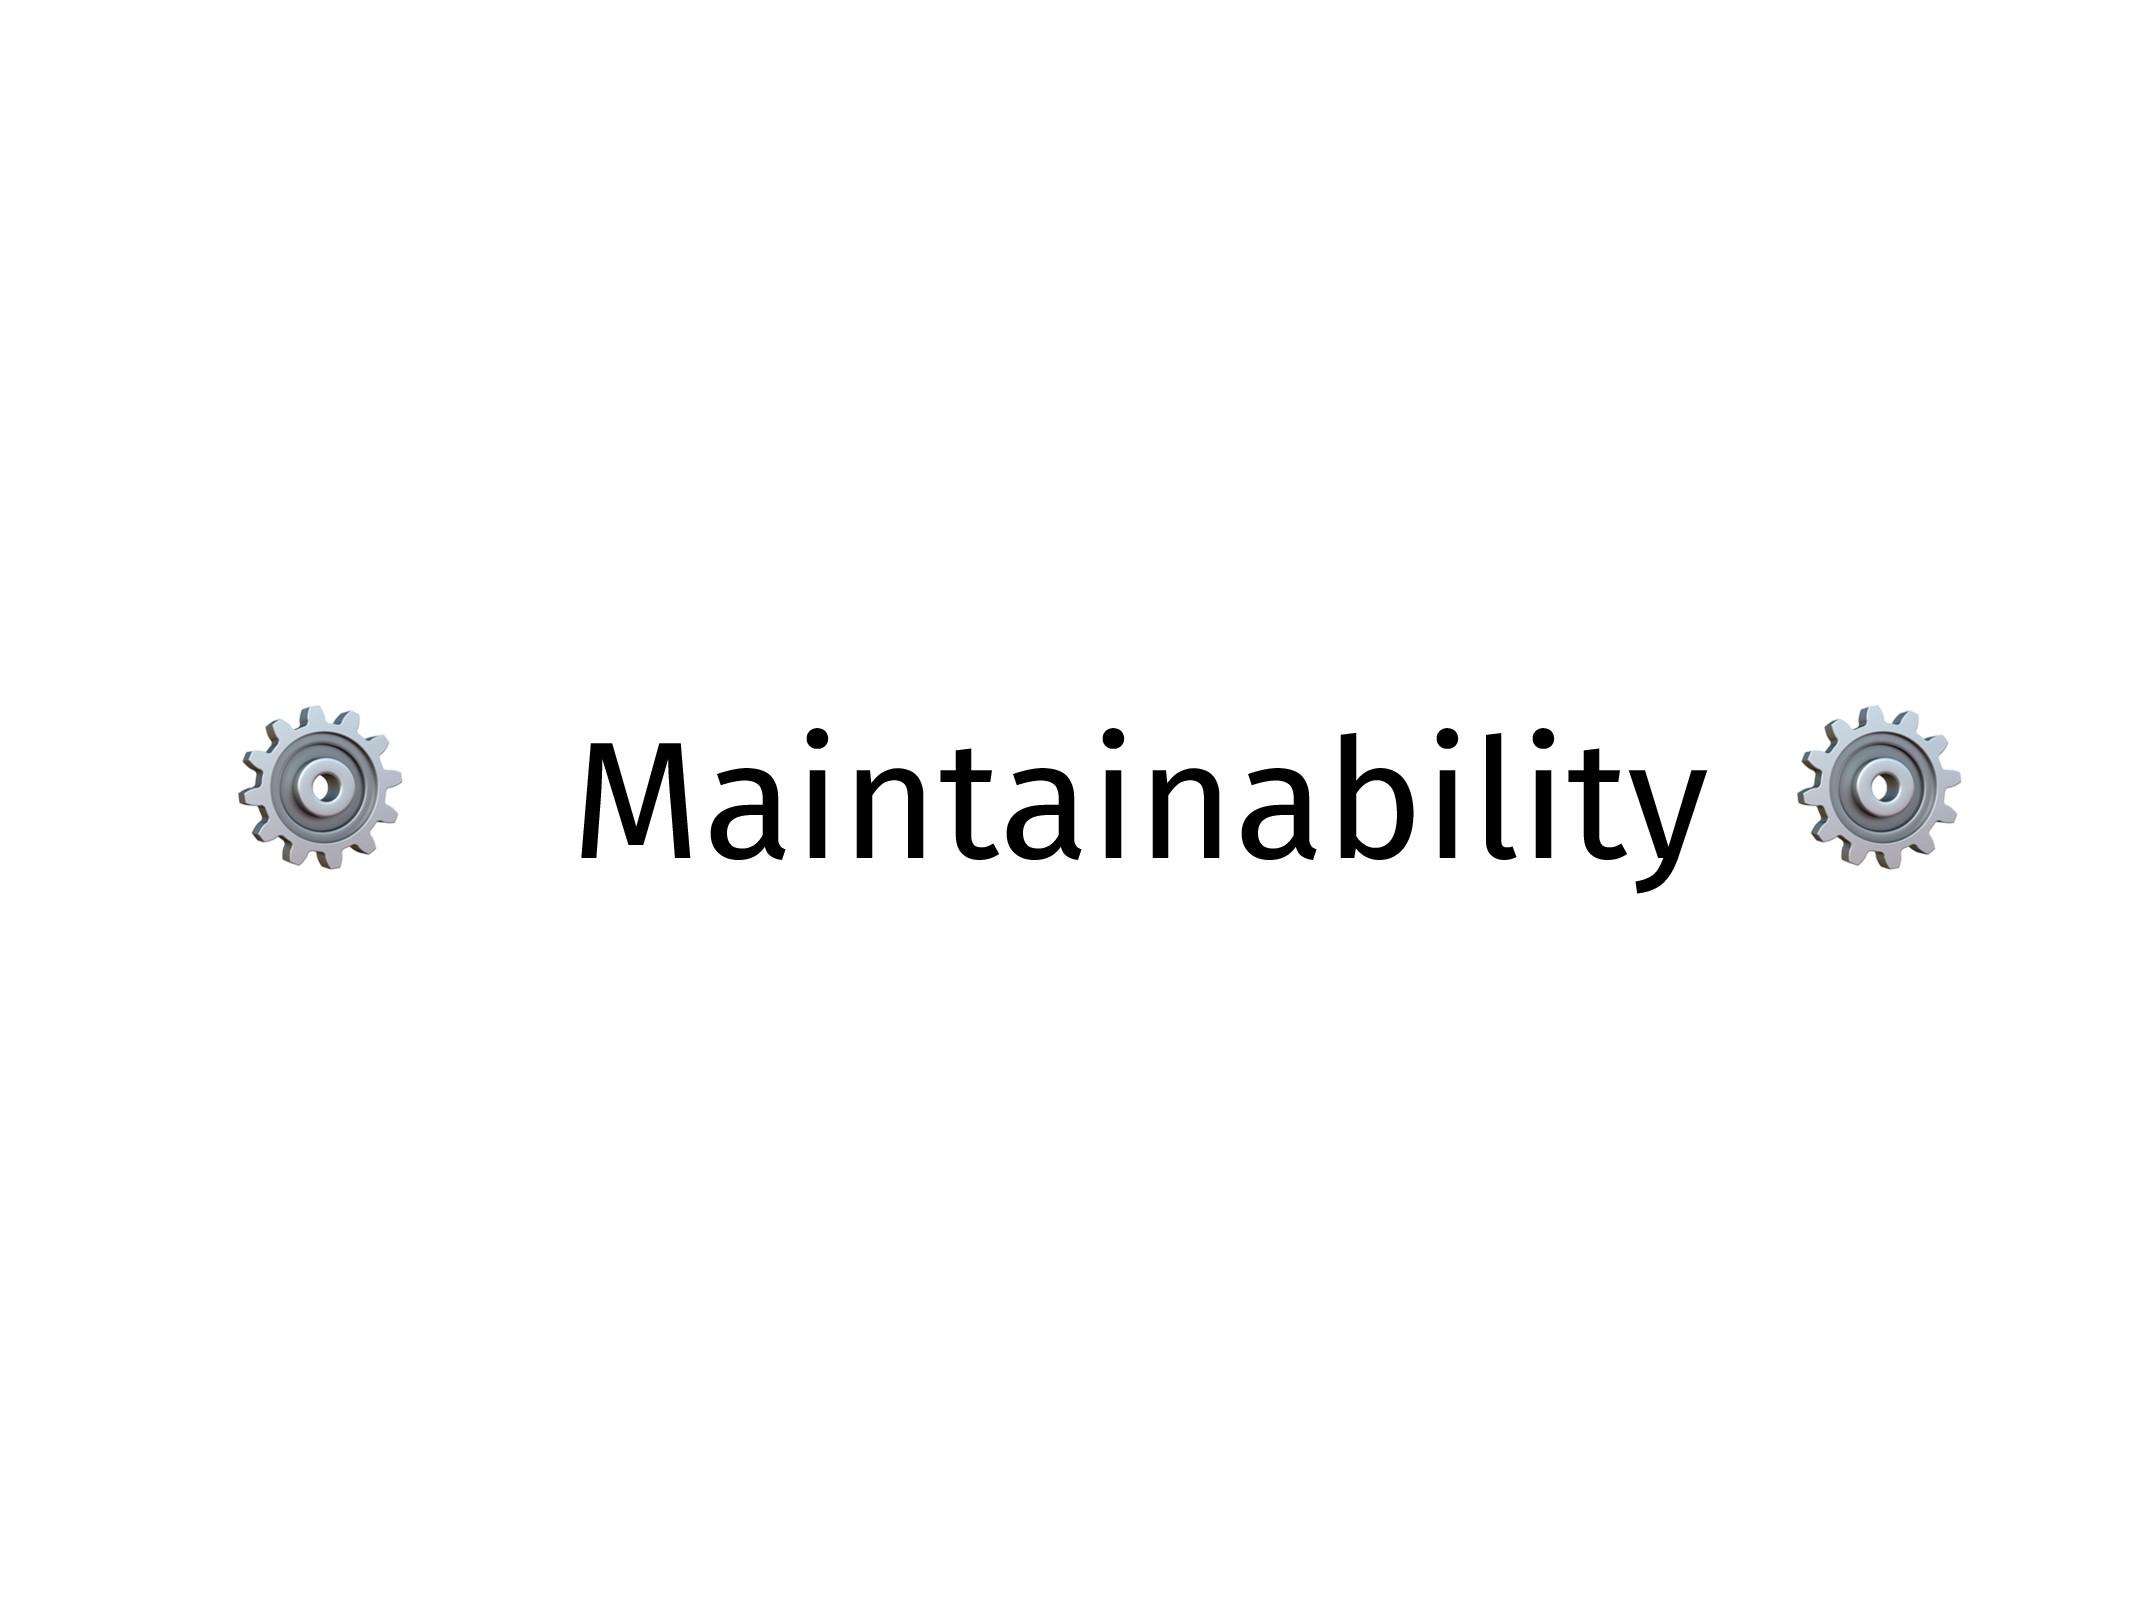 ⚙ Maintainability ⚙